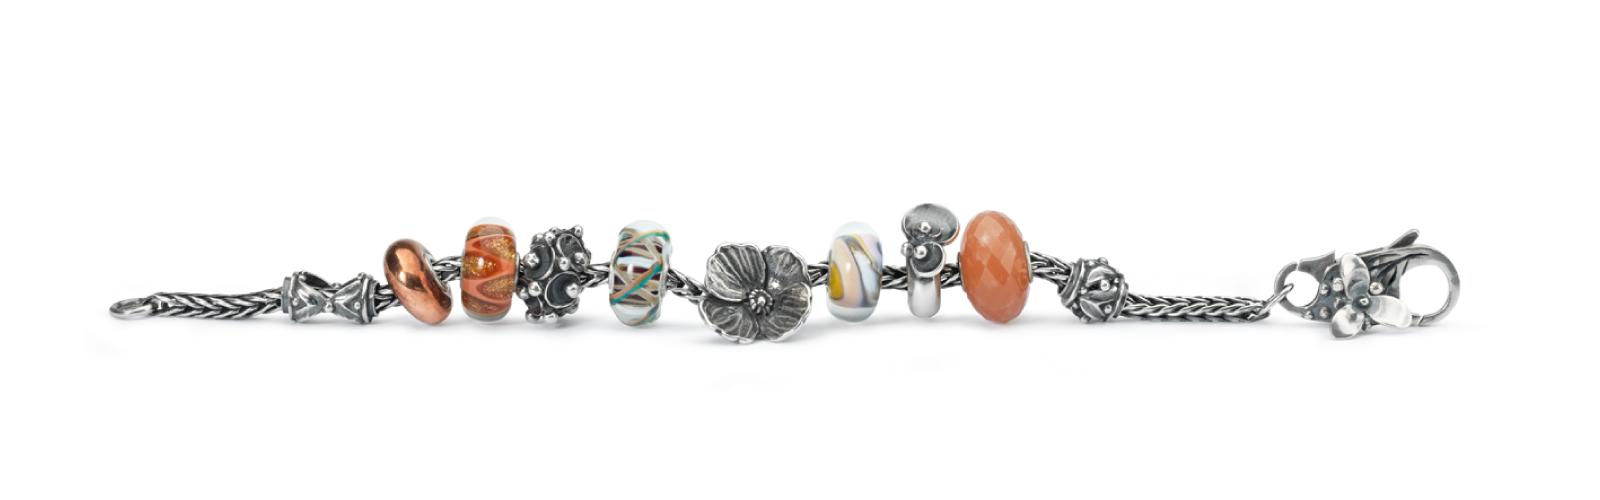 Spring Bracelet Trollbeads Wolters Juweliers Coevorden Emmen Hardenberg Hoogeveen